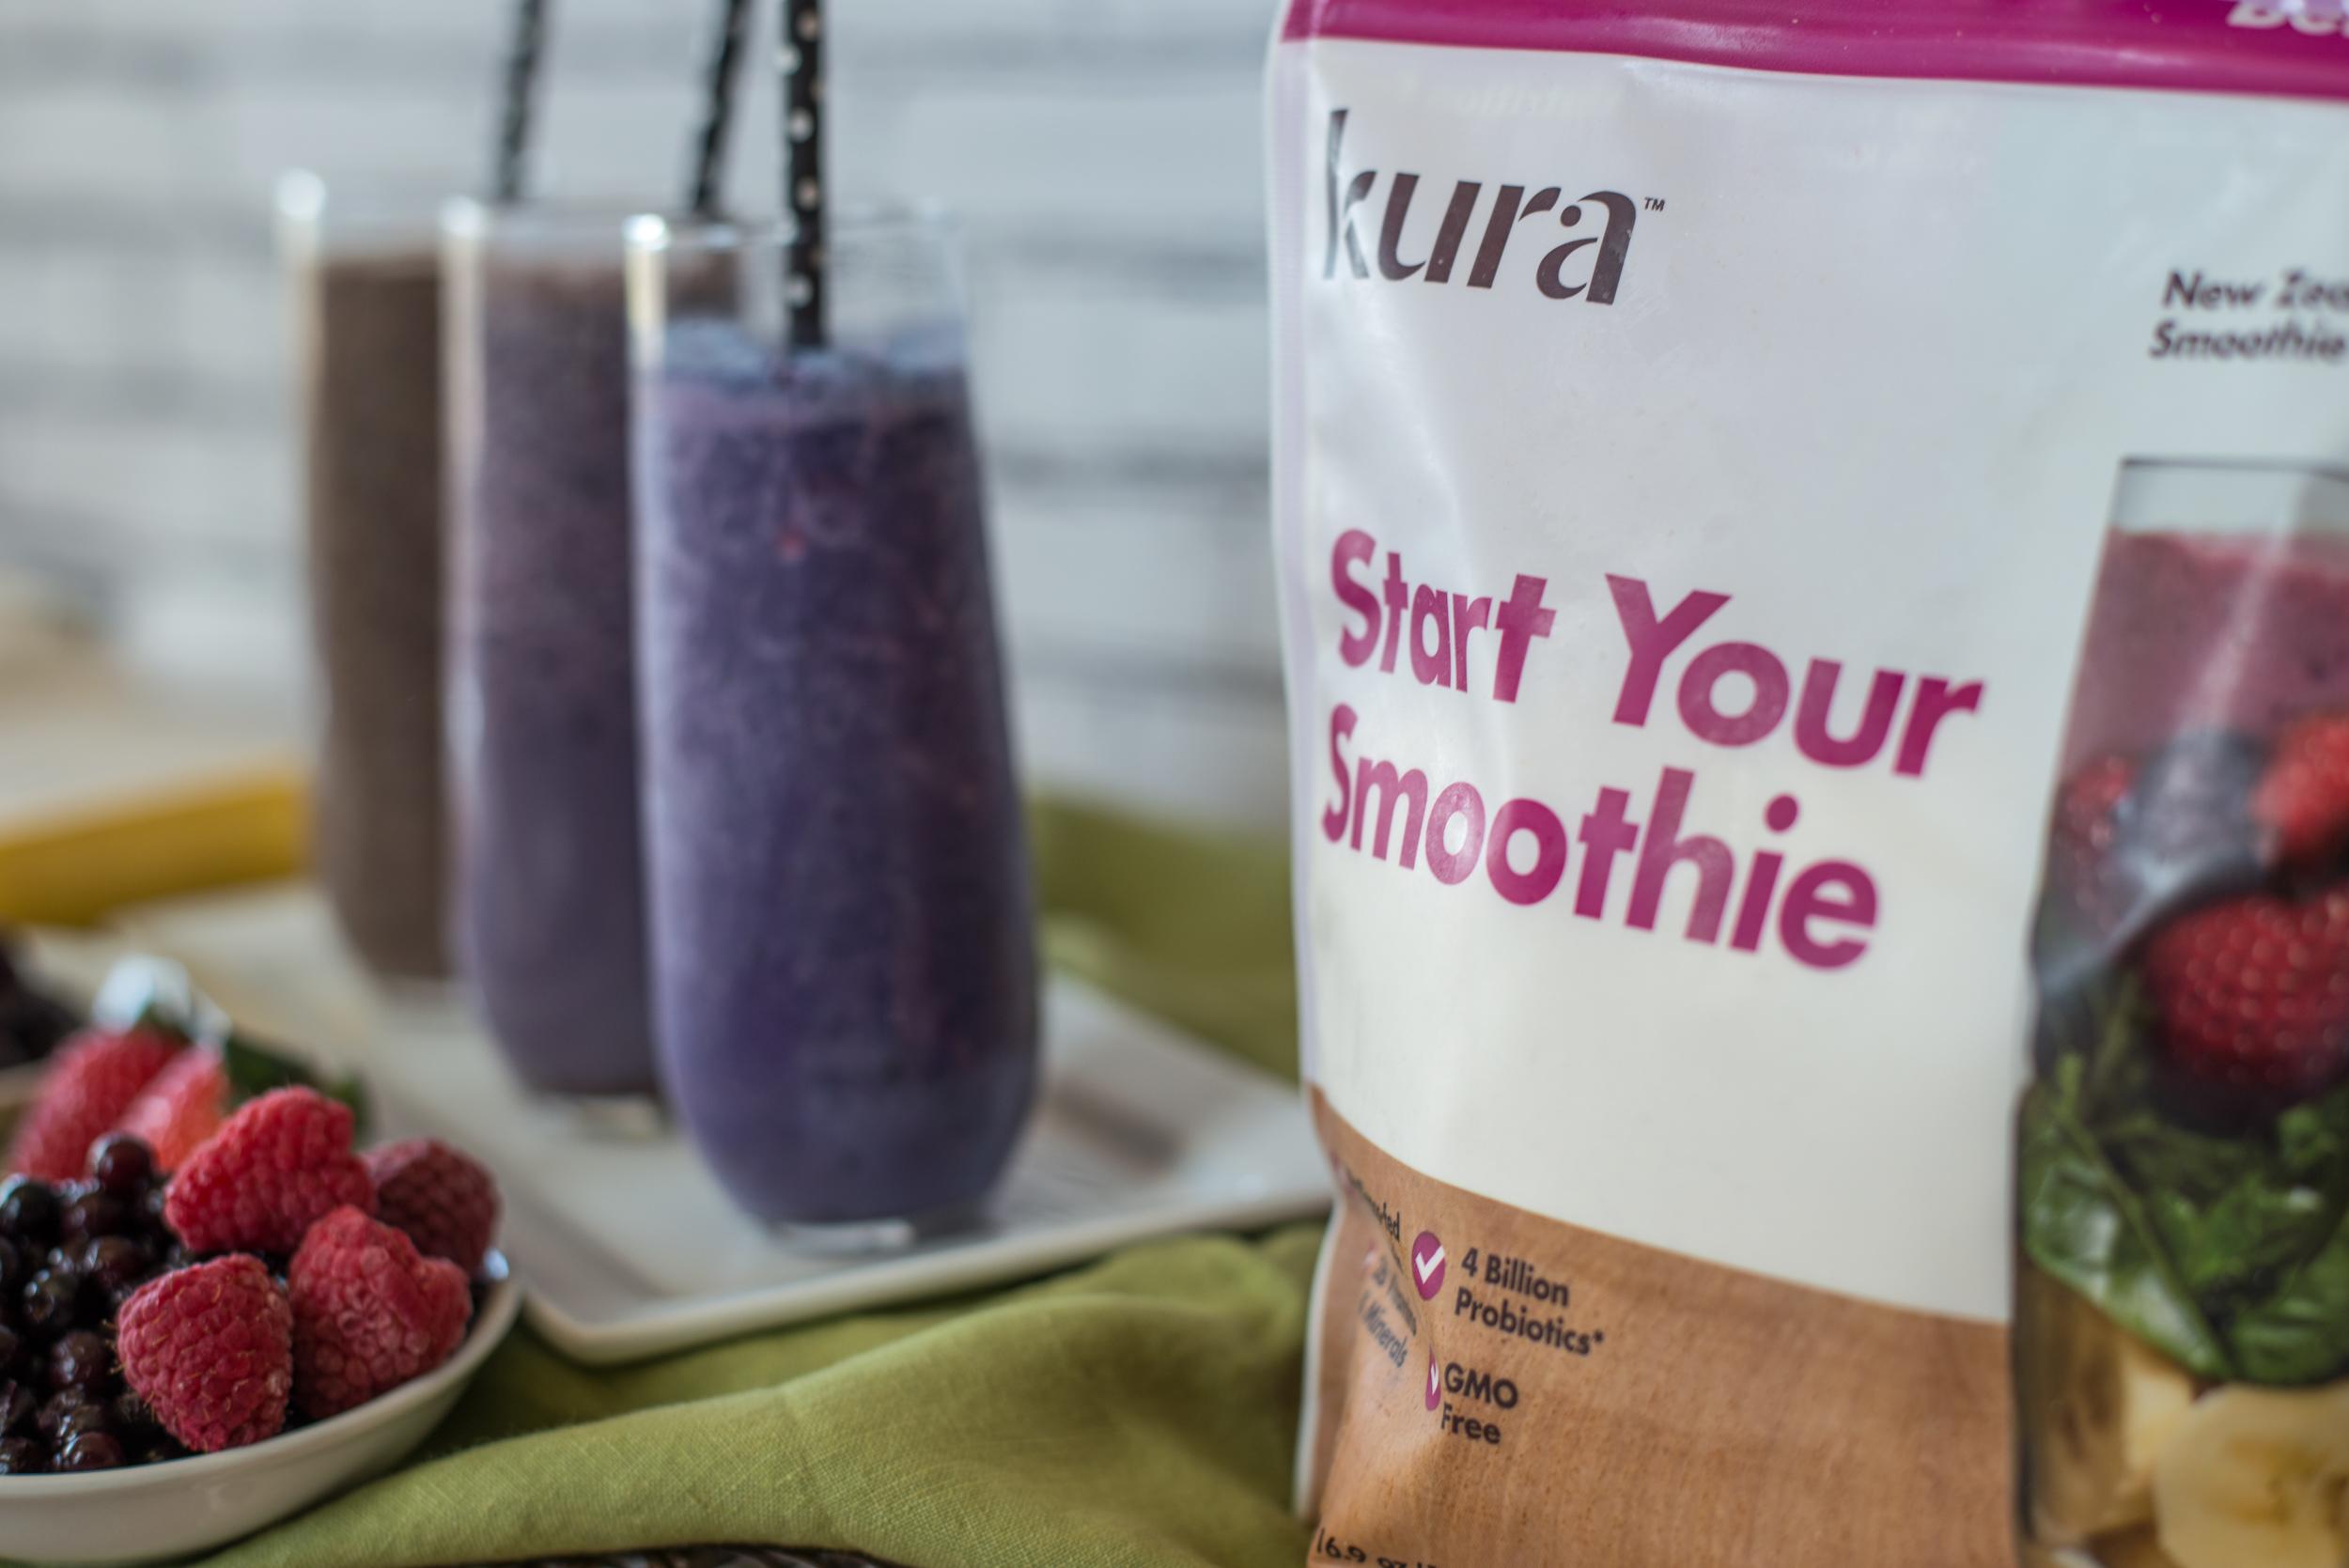 Kura smoothie powder